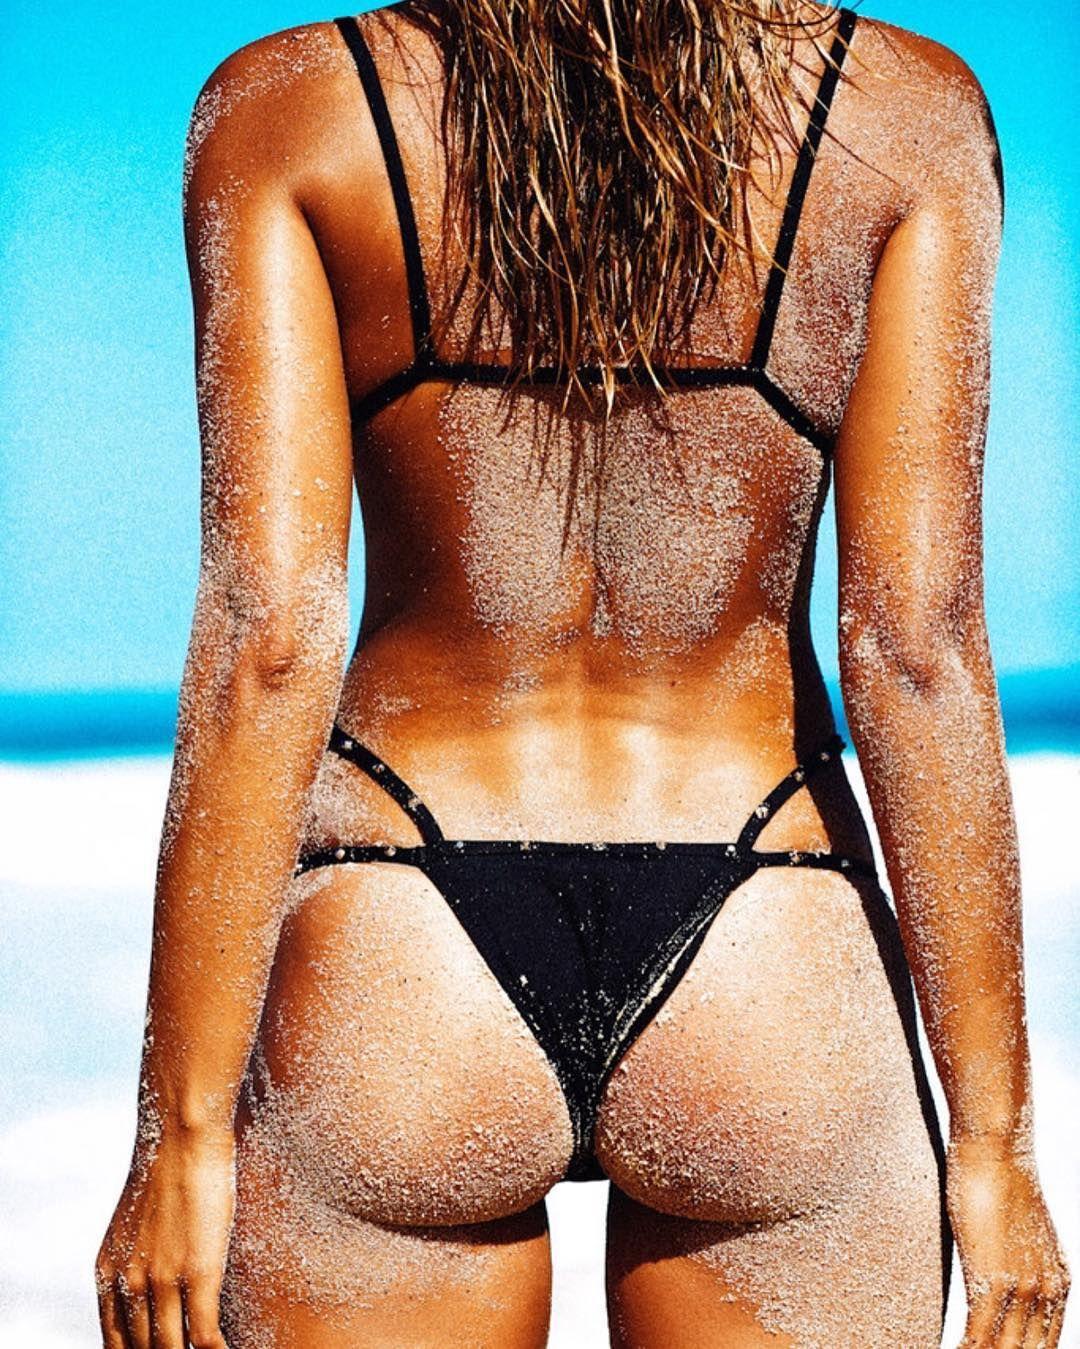 Sex Veronica Portillo naked (61 photo), Pussy, Bikini, Twitter, lingerie 2019